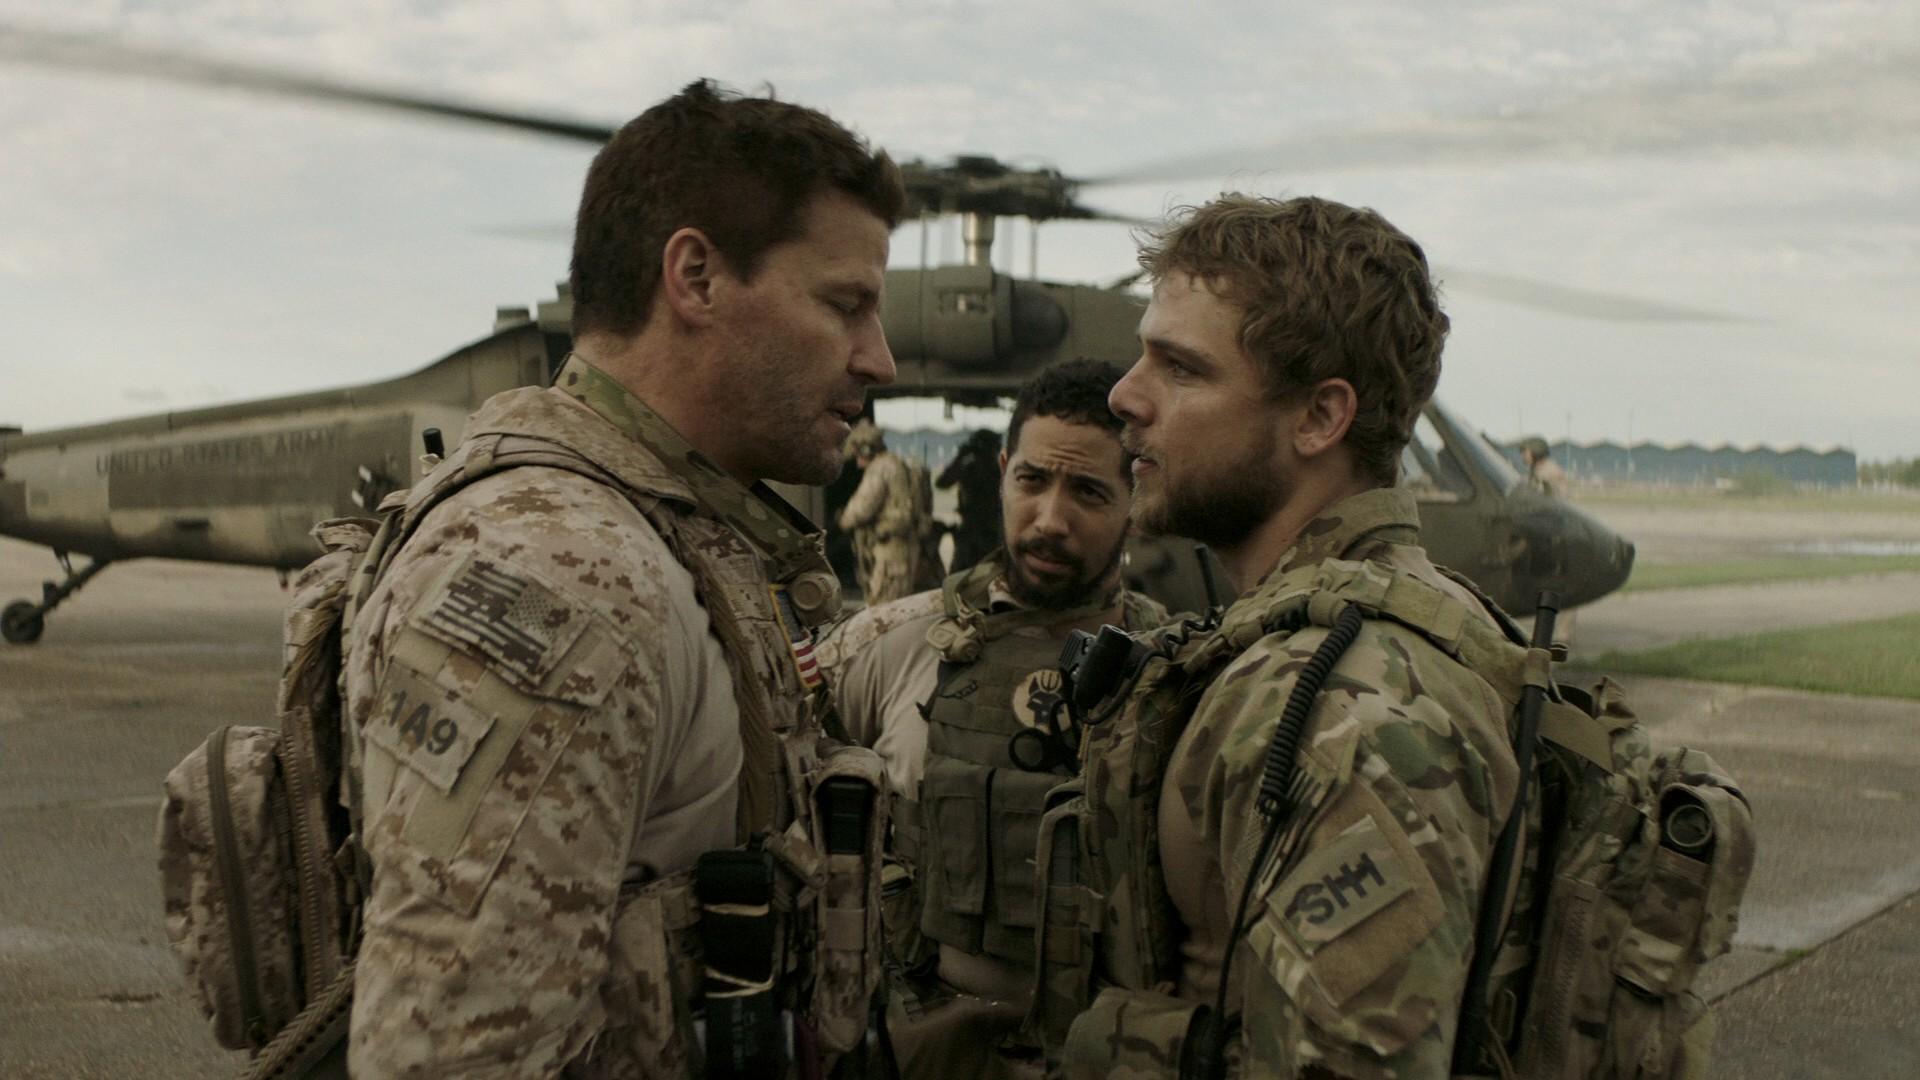 Спецназ / SEAL Team [01x01-02 из 21] (2017) WEBRip 1080p | Alternative Production